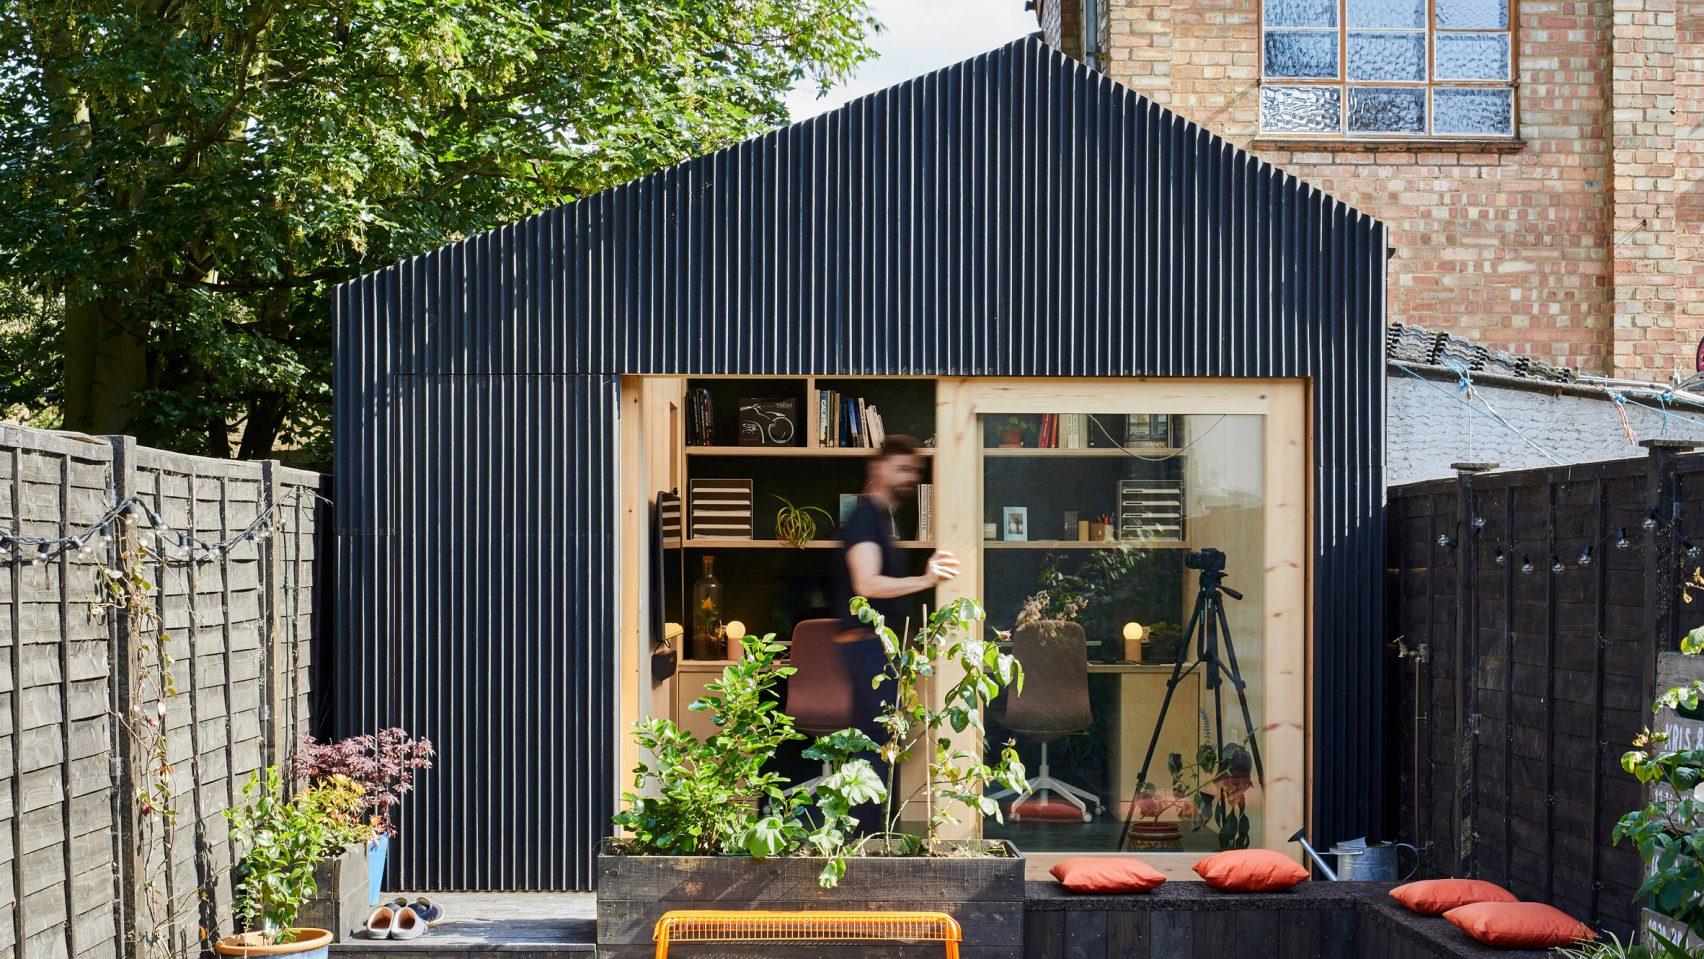 the-light-shed-richard-john-andrews-london-england-uk_hero-b-1704x959